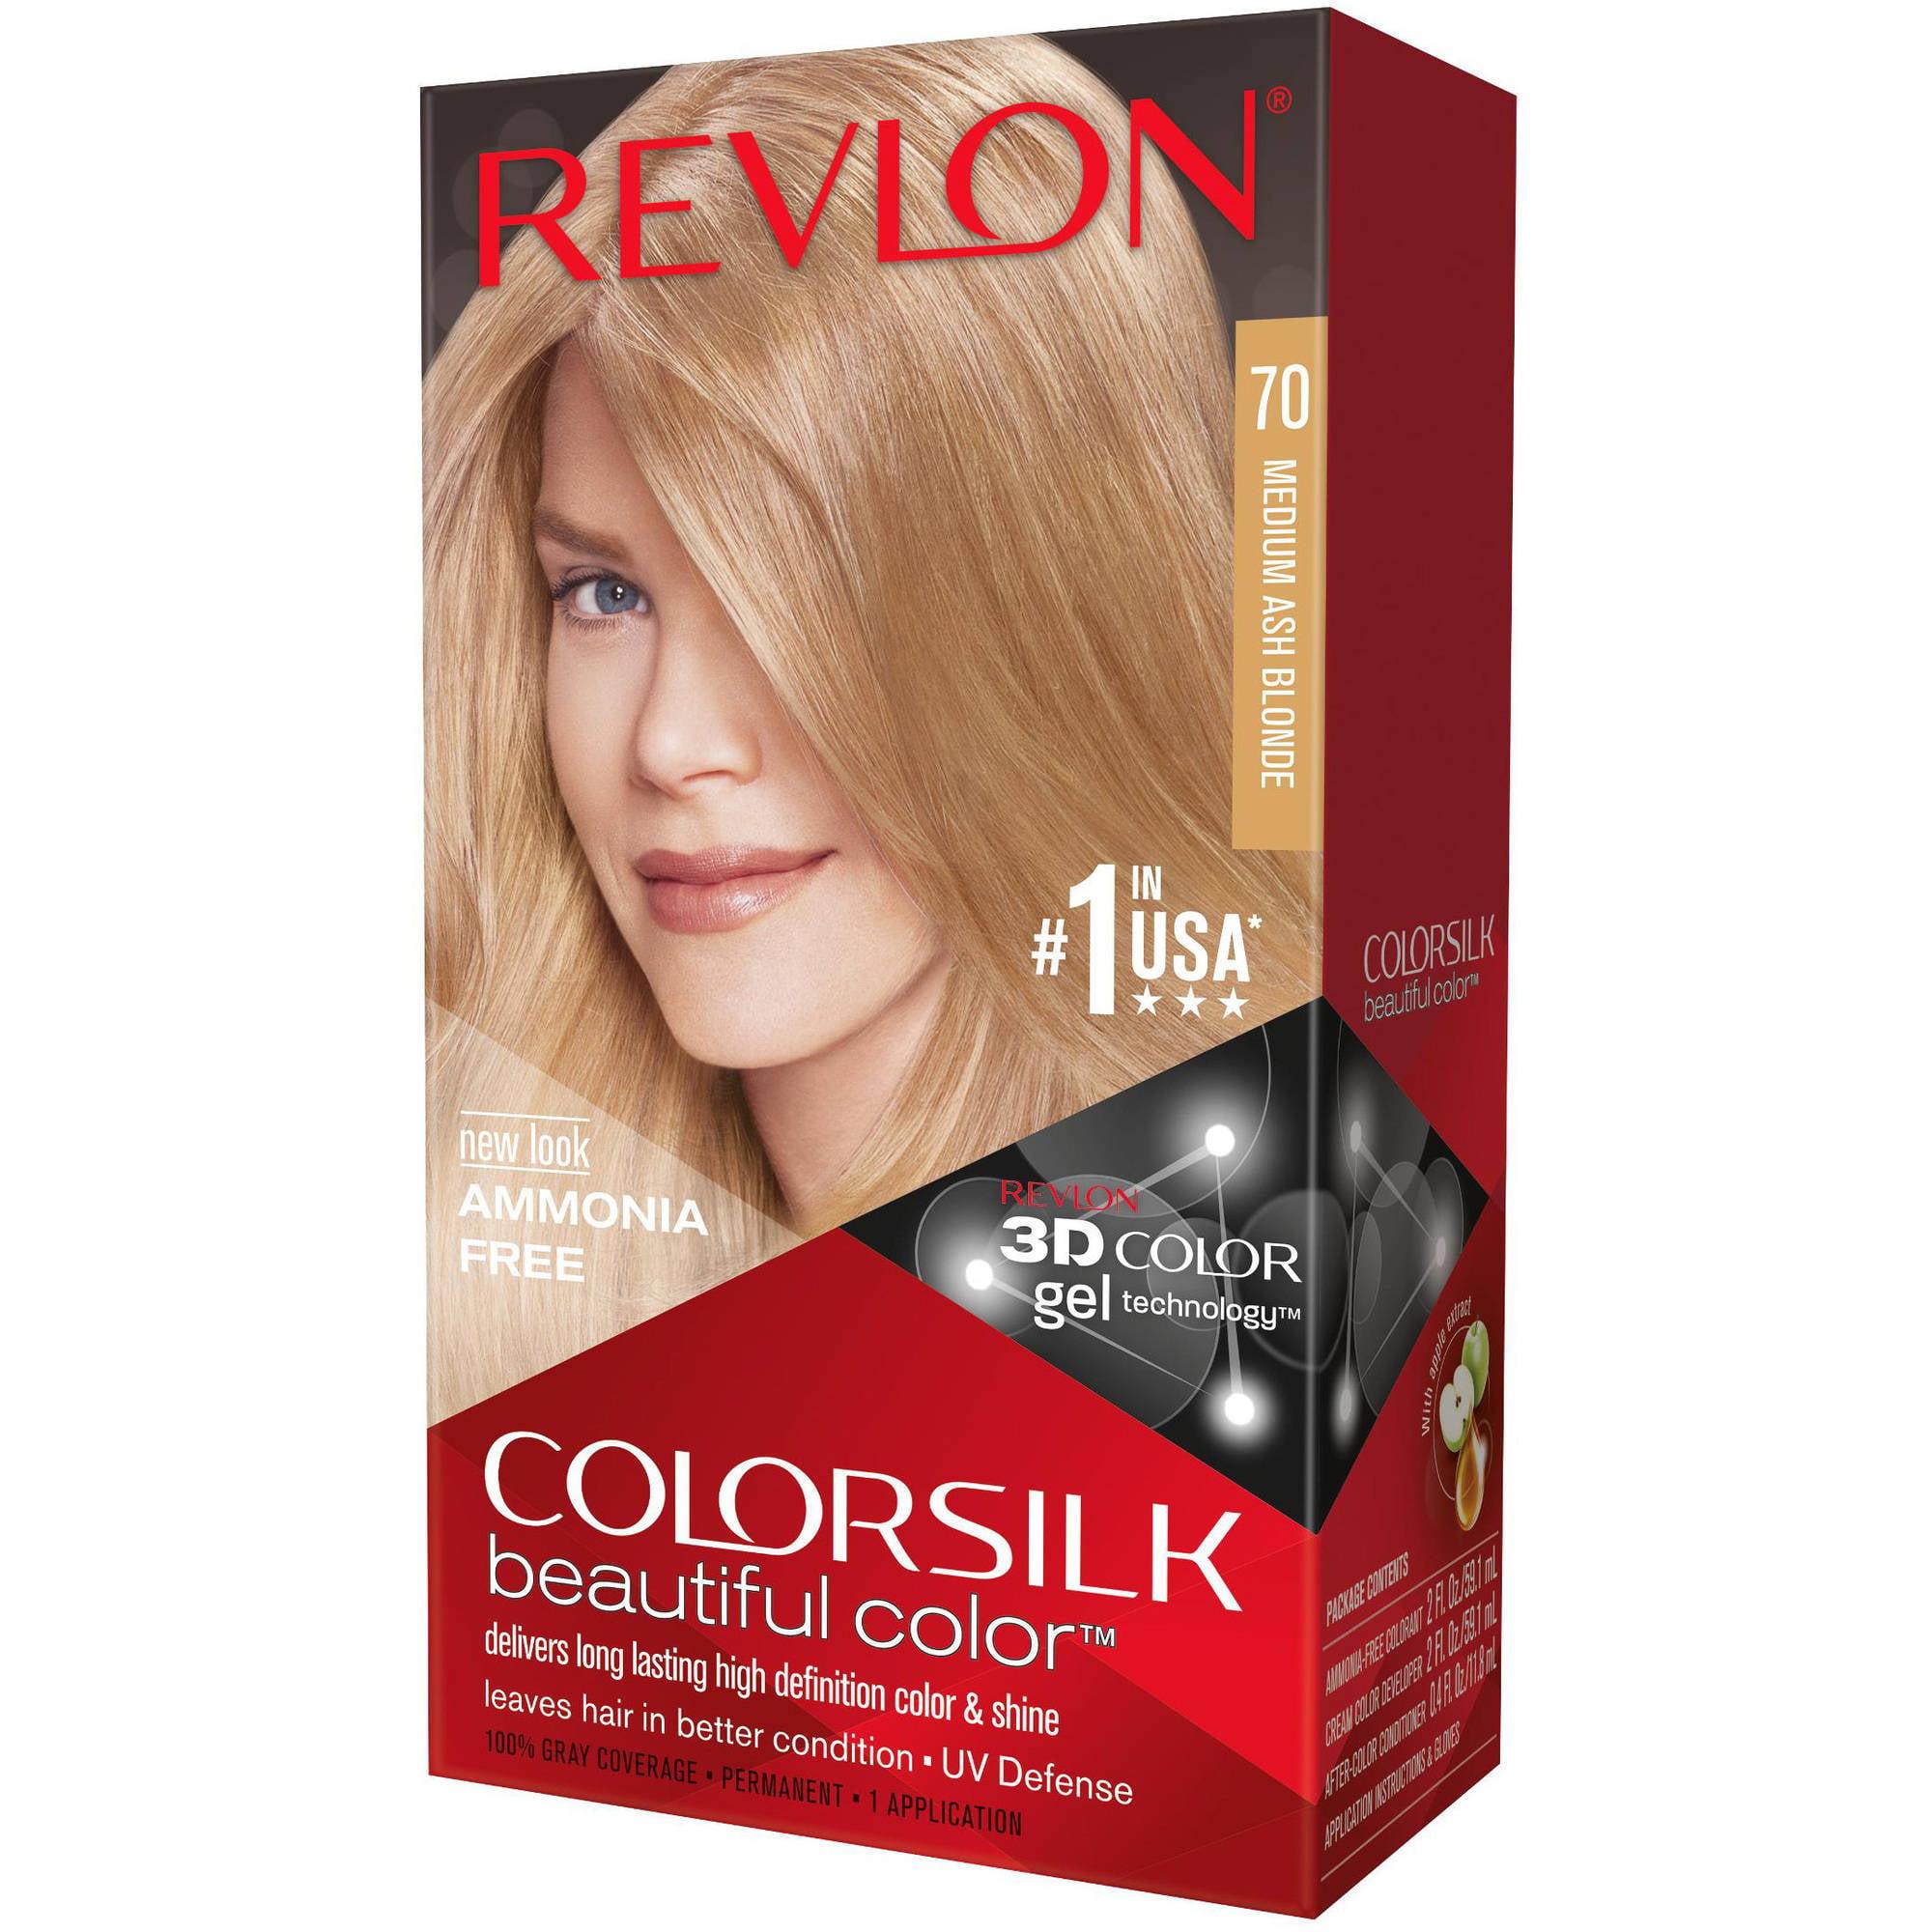 Revlon ColorSilk Beautiful Color Hair Color, 70 Medium Ash Blonde